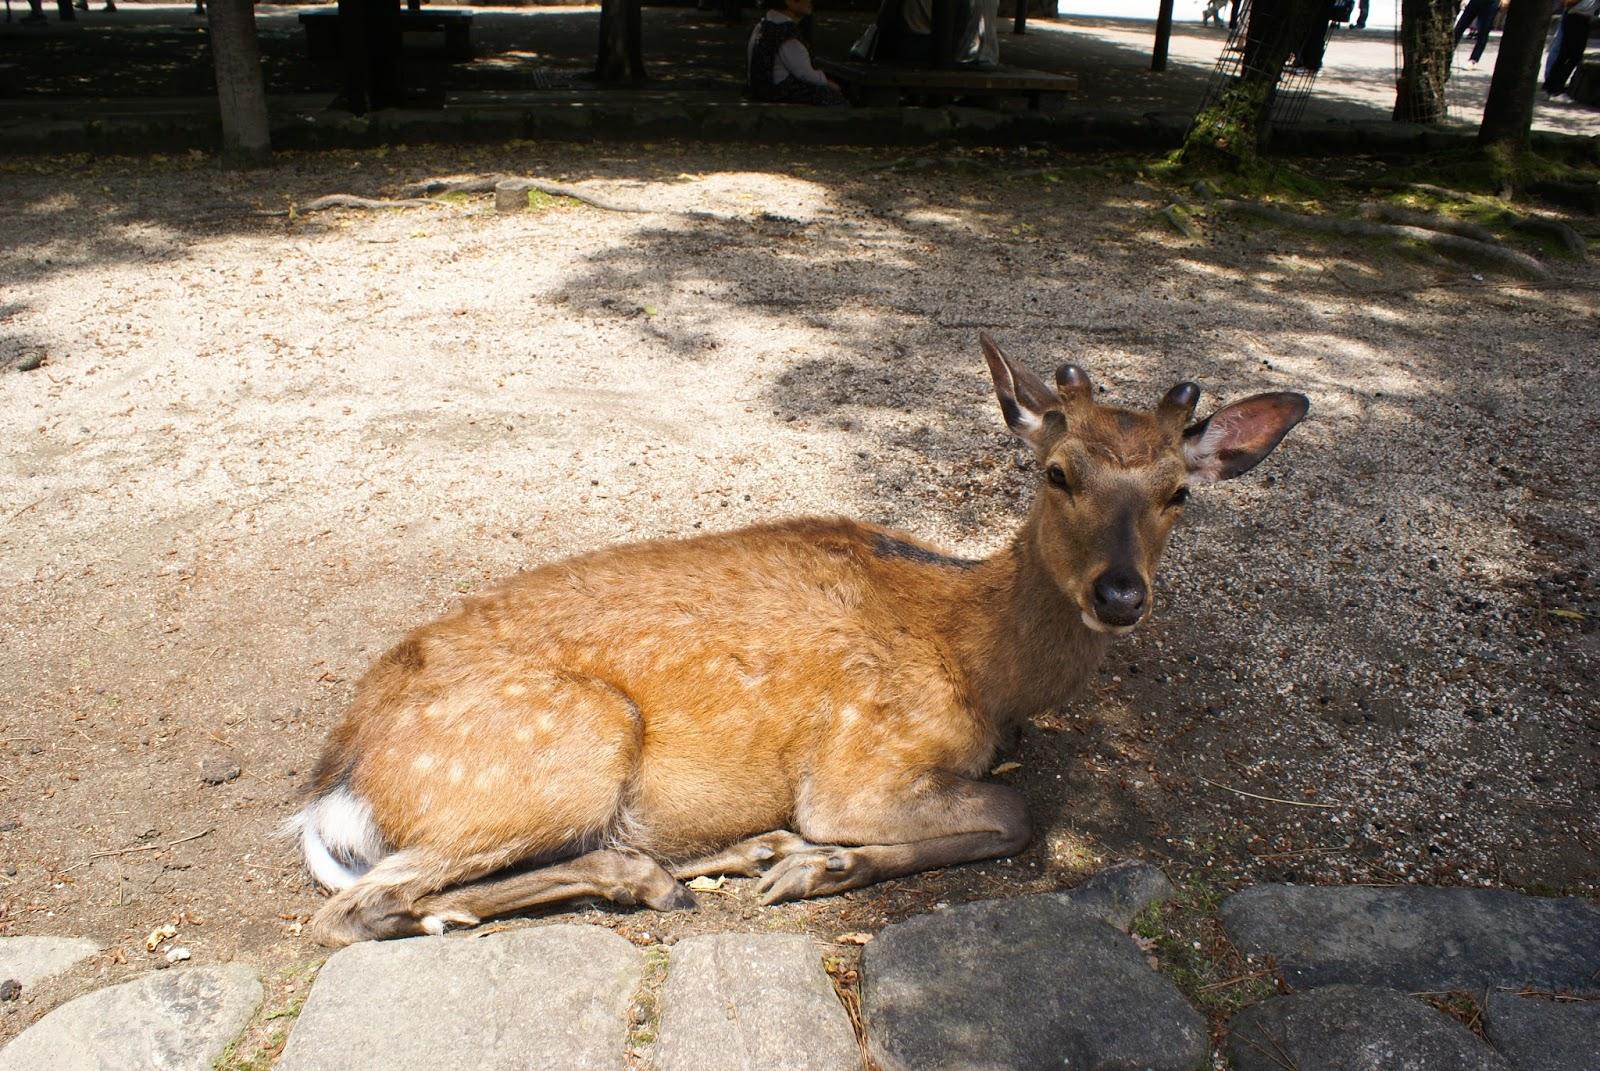 deer shika miyajima itsukushima japan